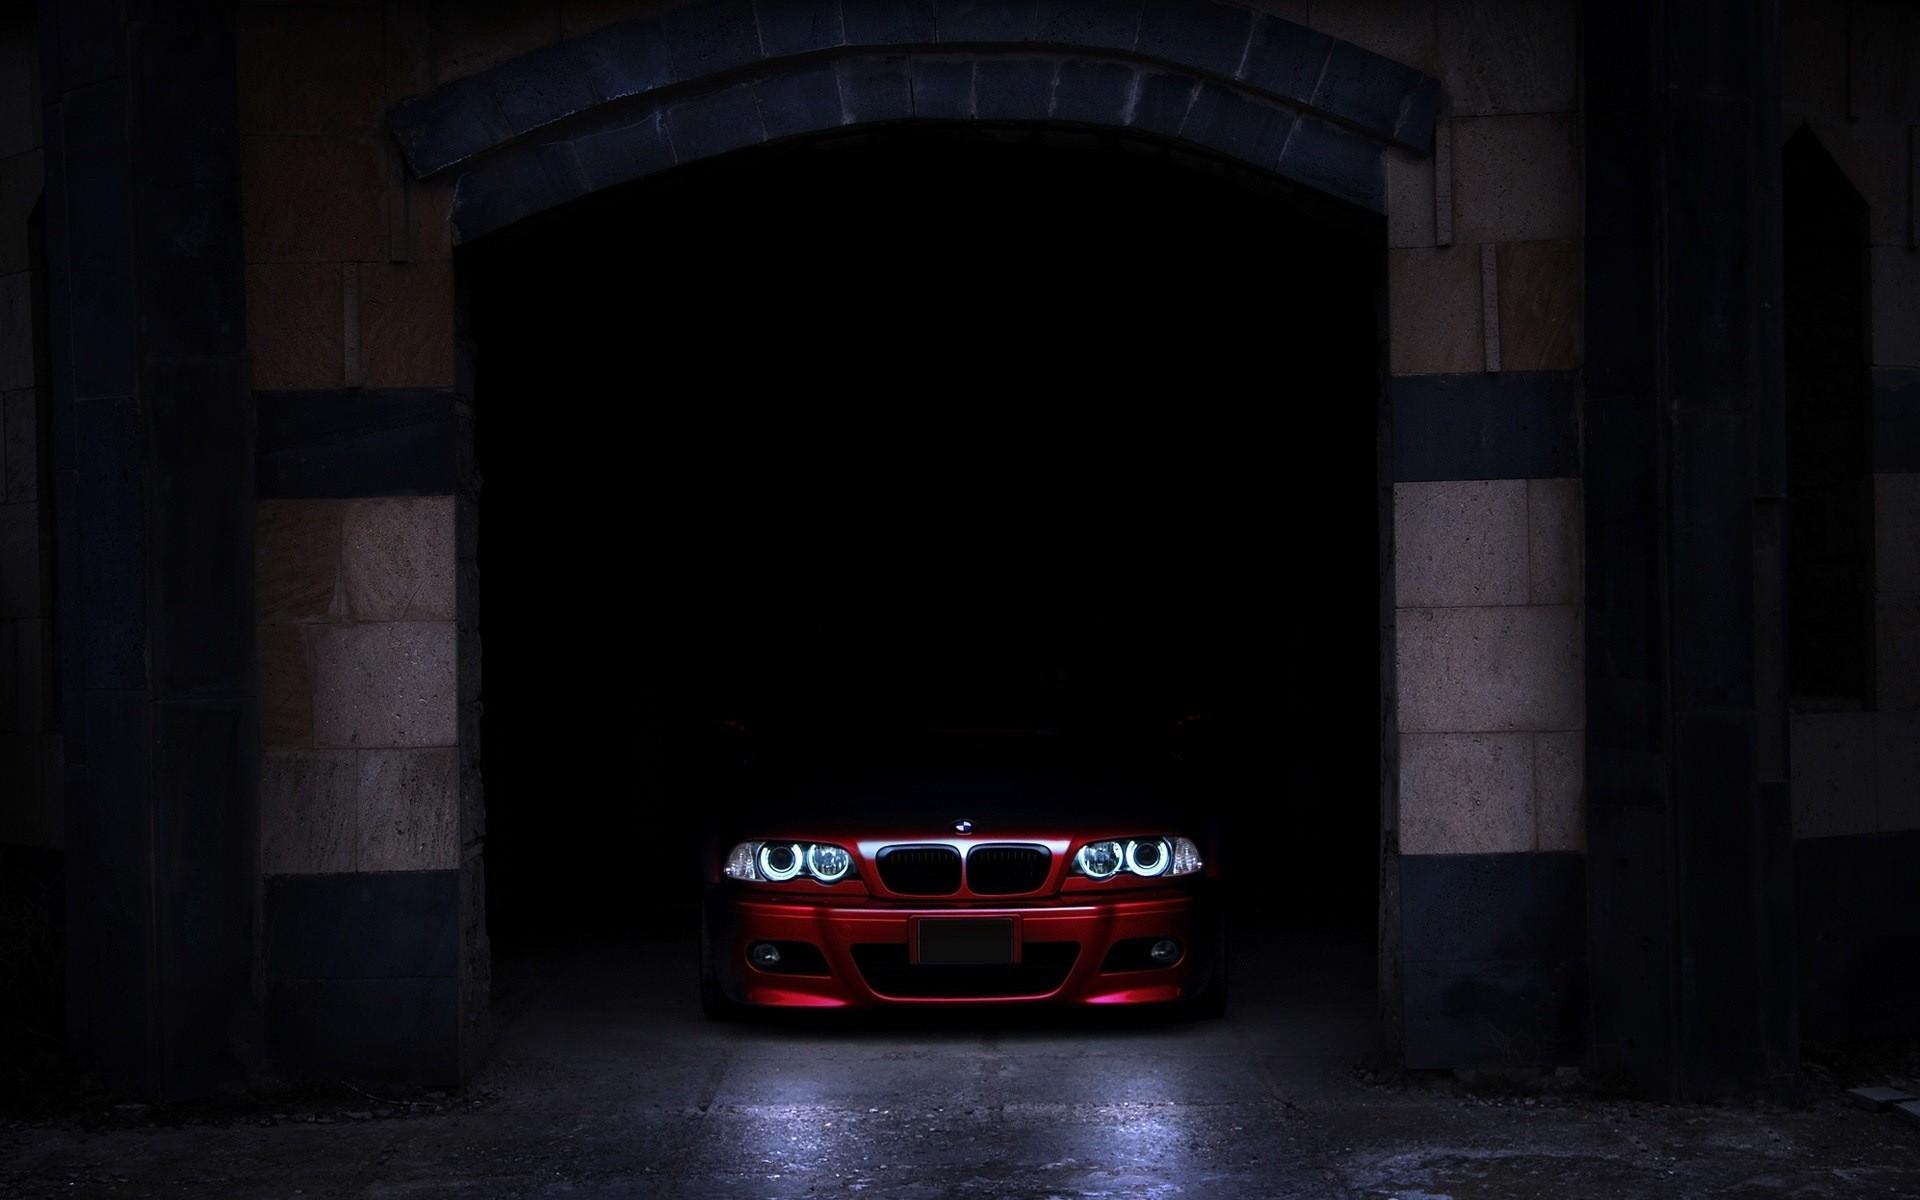 Wallpaper Night Car Shadow Vehicle Bmw E46 Angel Eyes